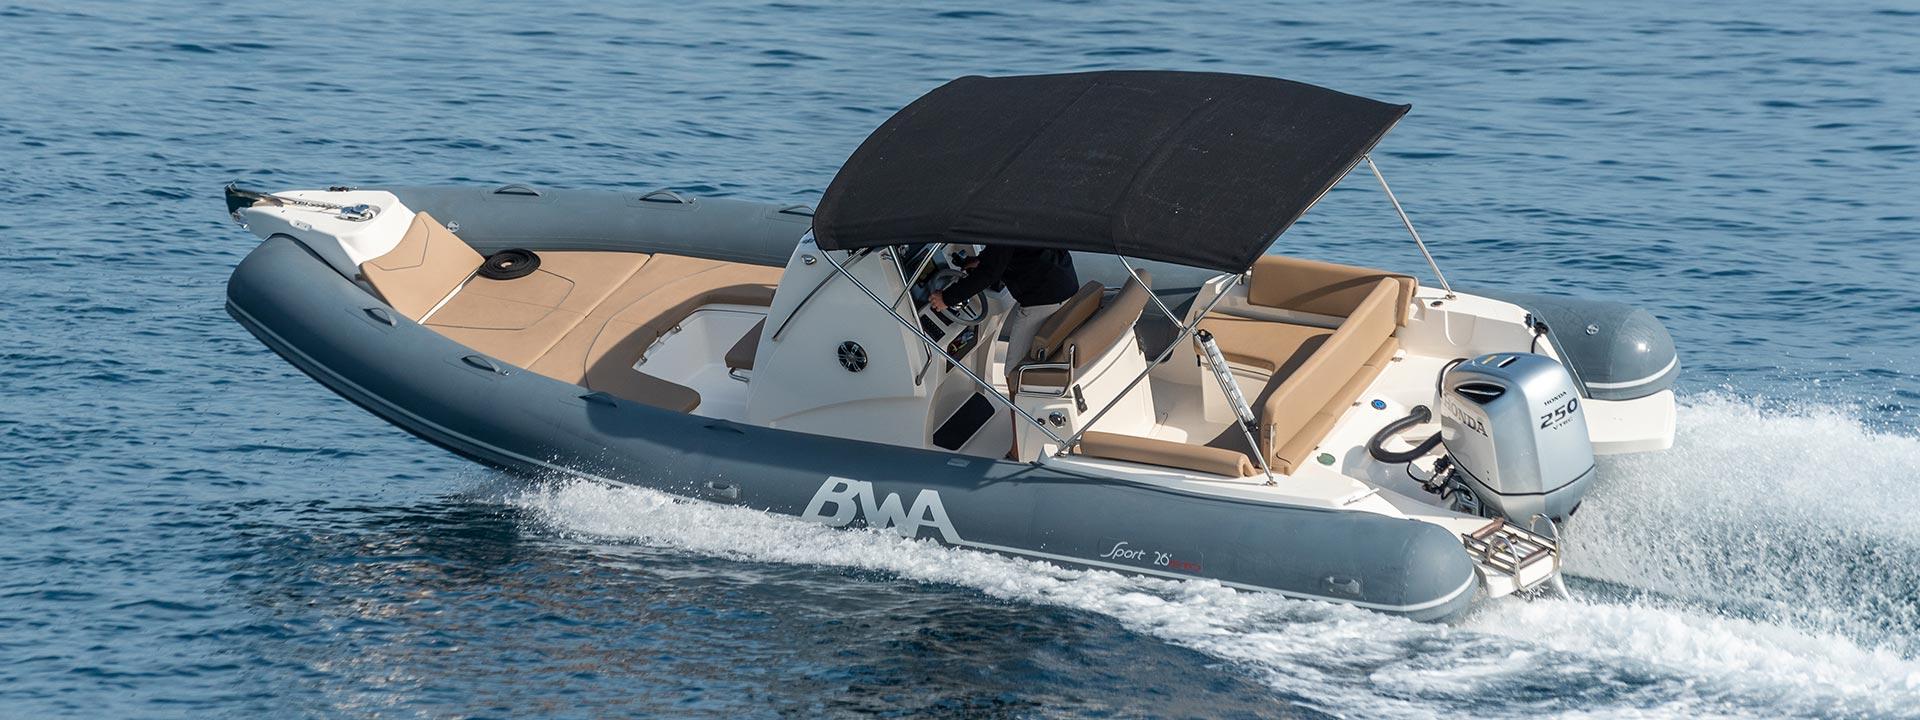 mayer-charter-boat-header-bwa-gto-sport-26-01